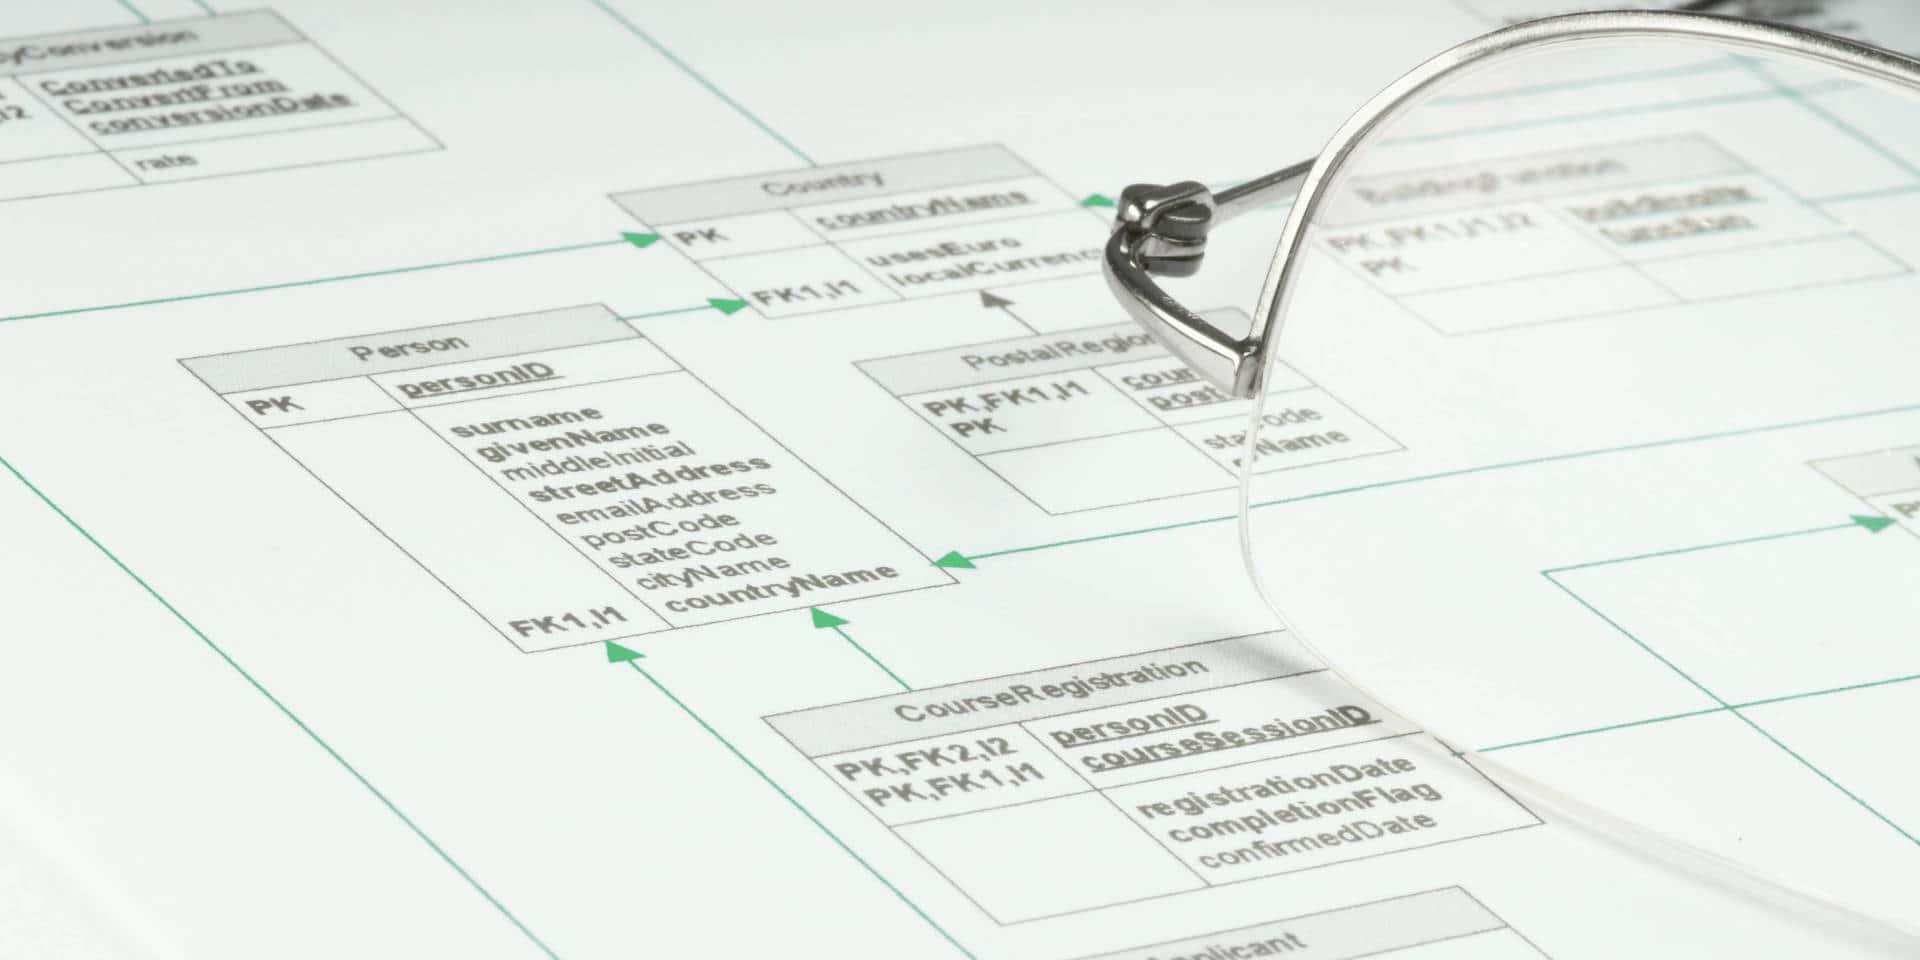 projektový management AVES